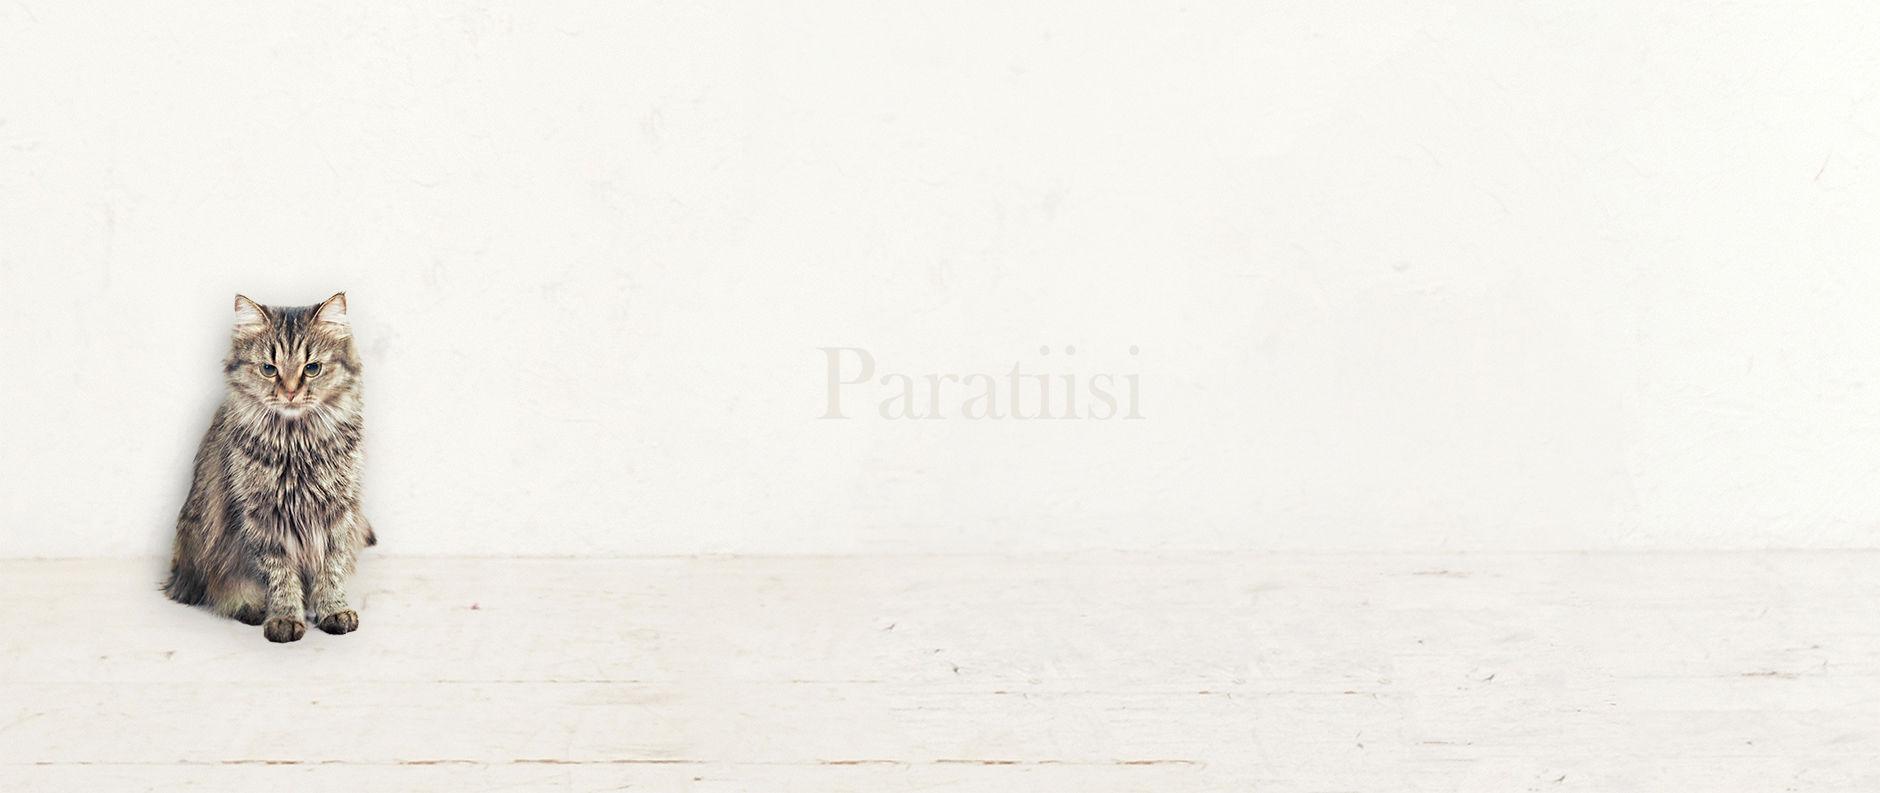 Paratiisi